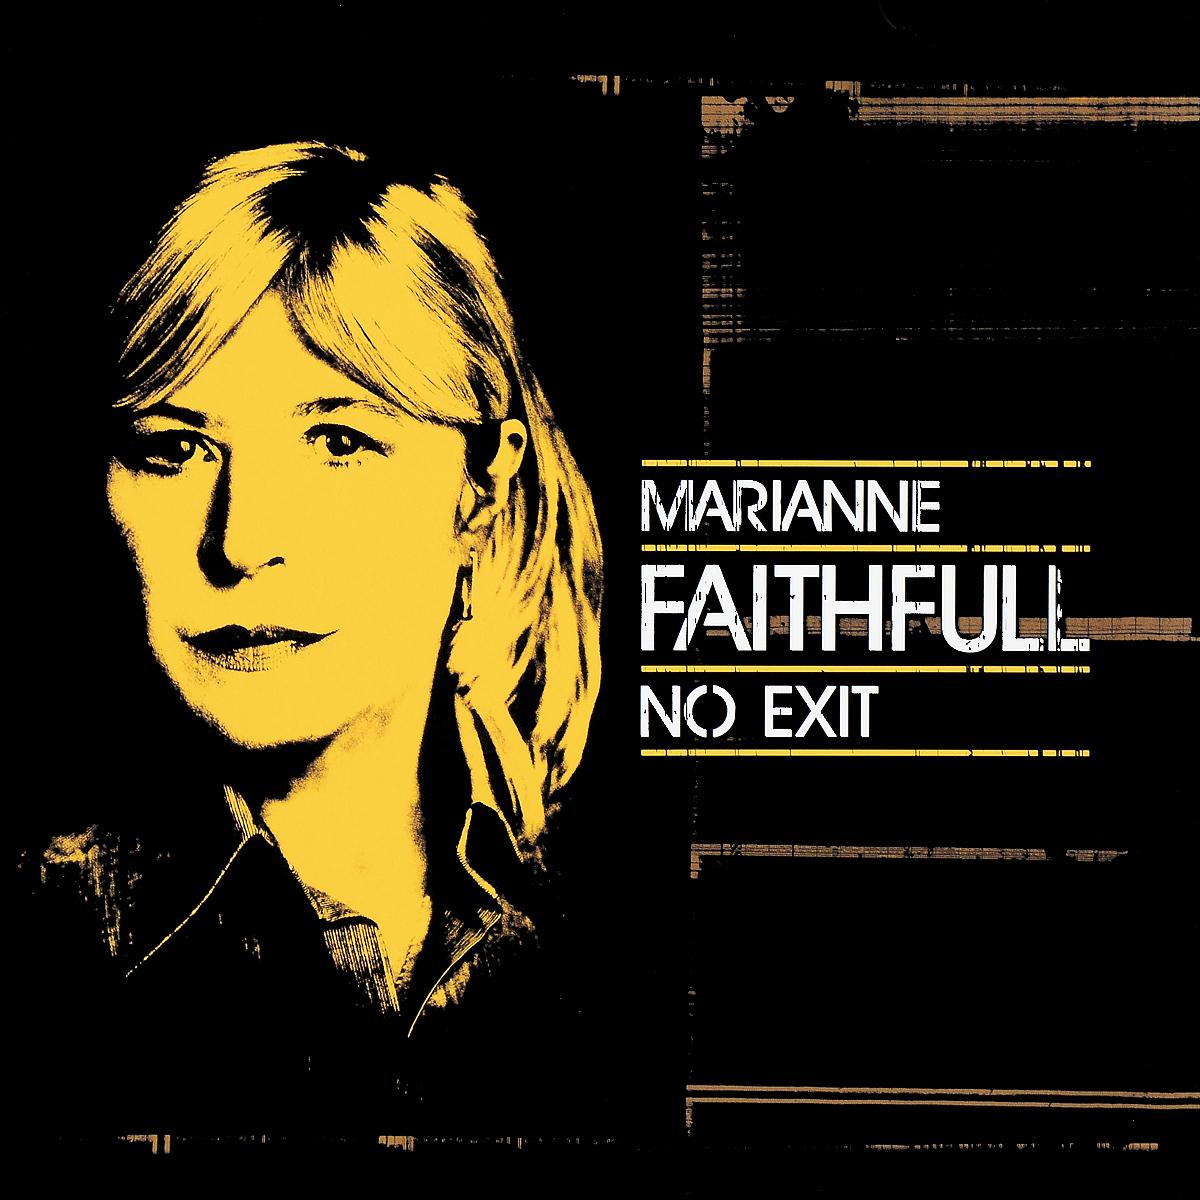 Мэриэнн Фэйтфулл Marianne Faithfull. No Exit (LP) marianne faithfull